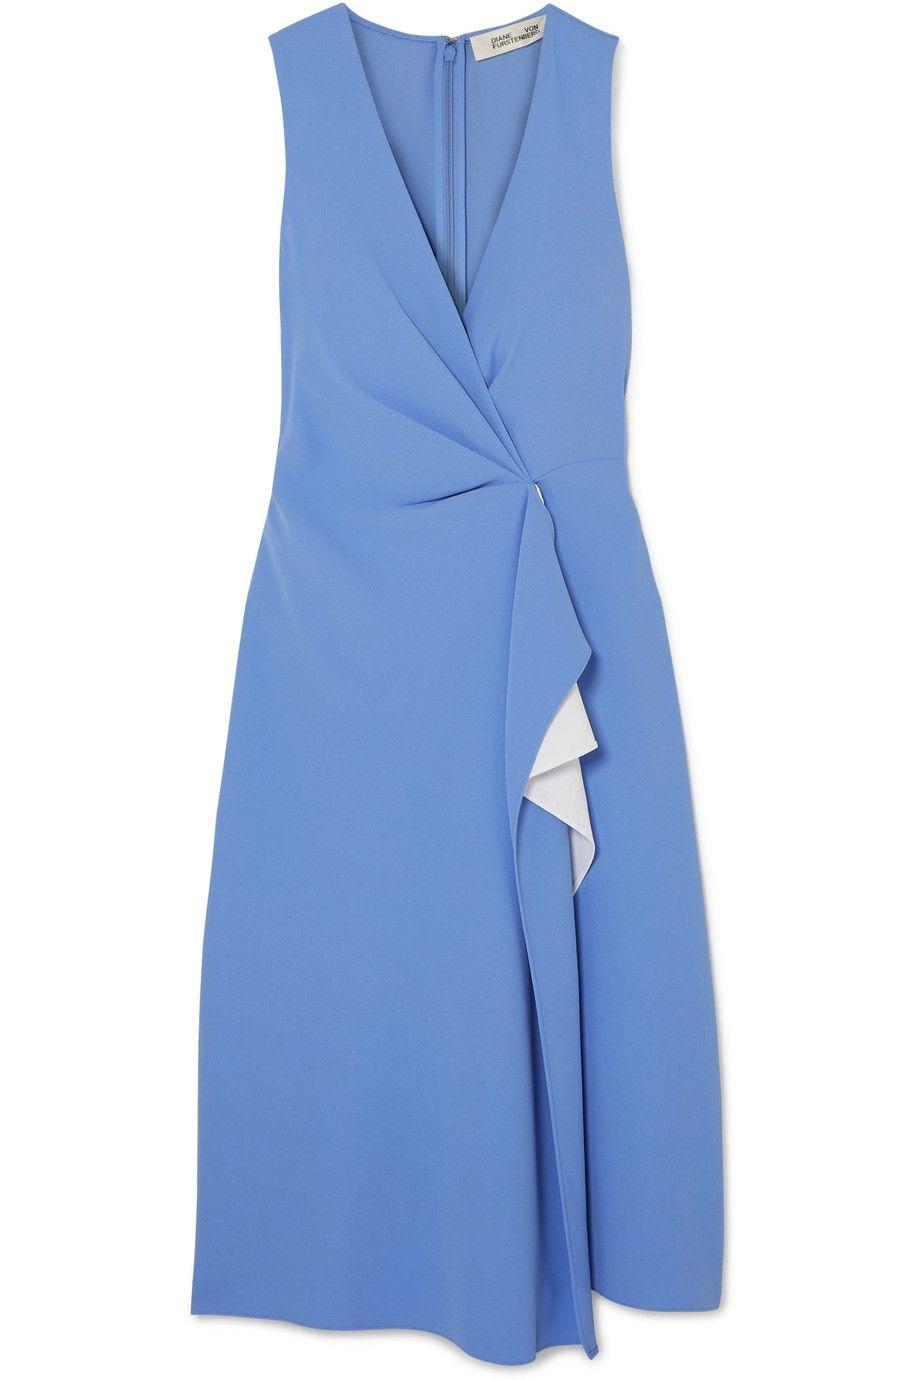 Addison Ruffled Crepe Dress